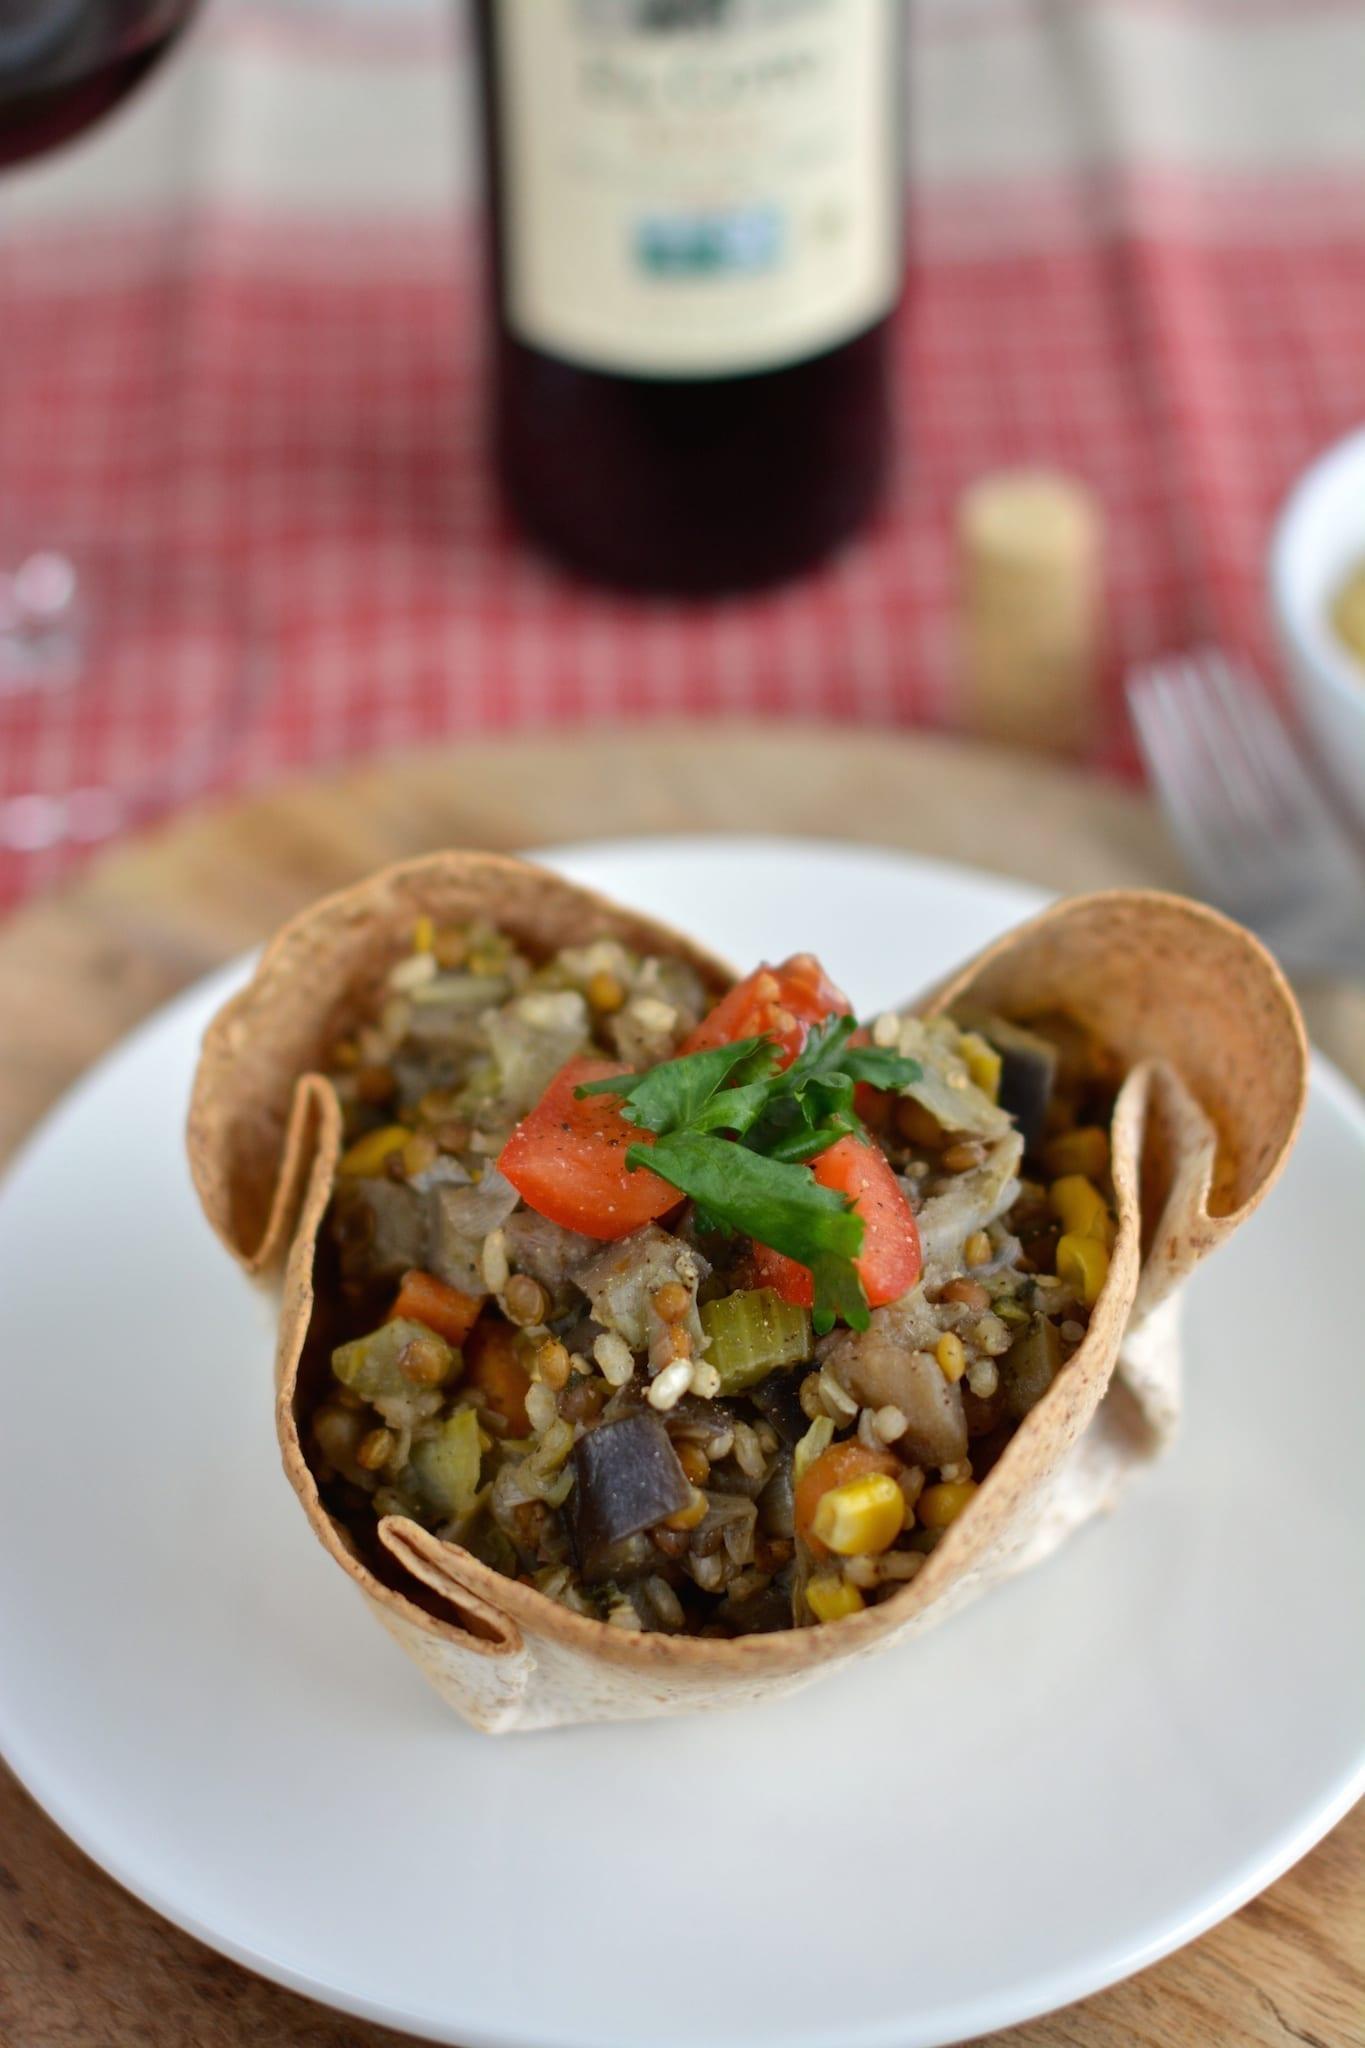 Tortilla Bowls Filled with Rice-Lentil-Veggie Stew